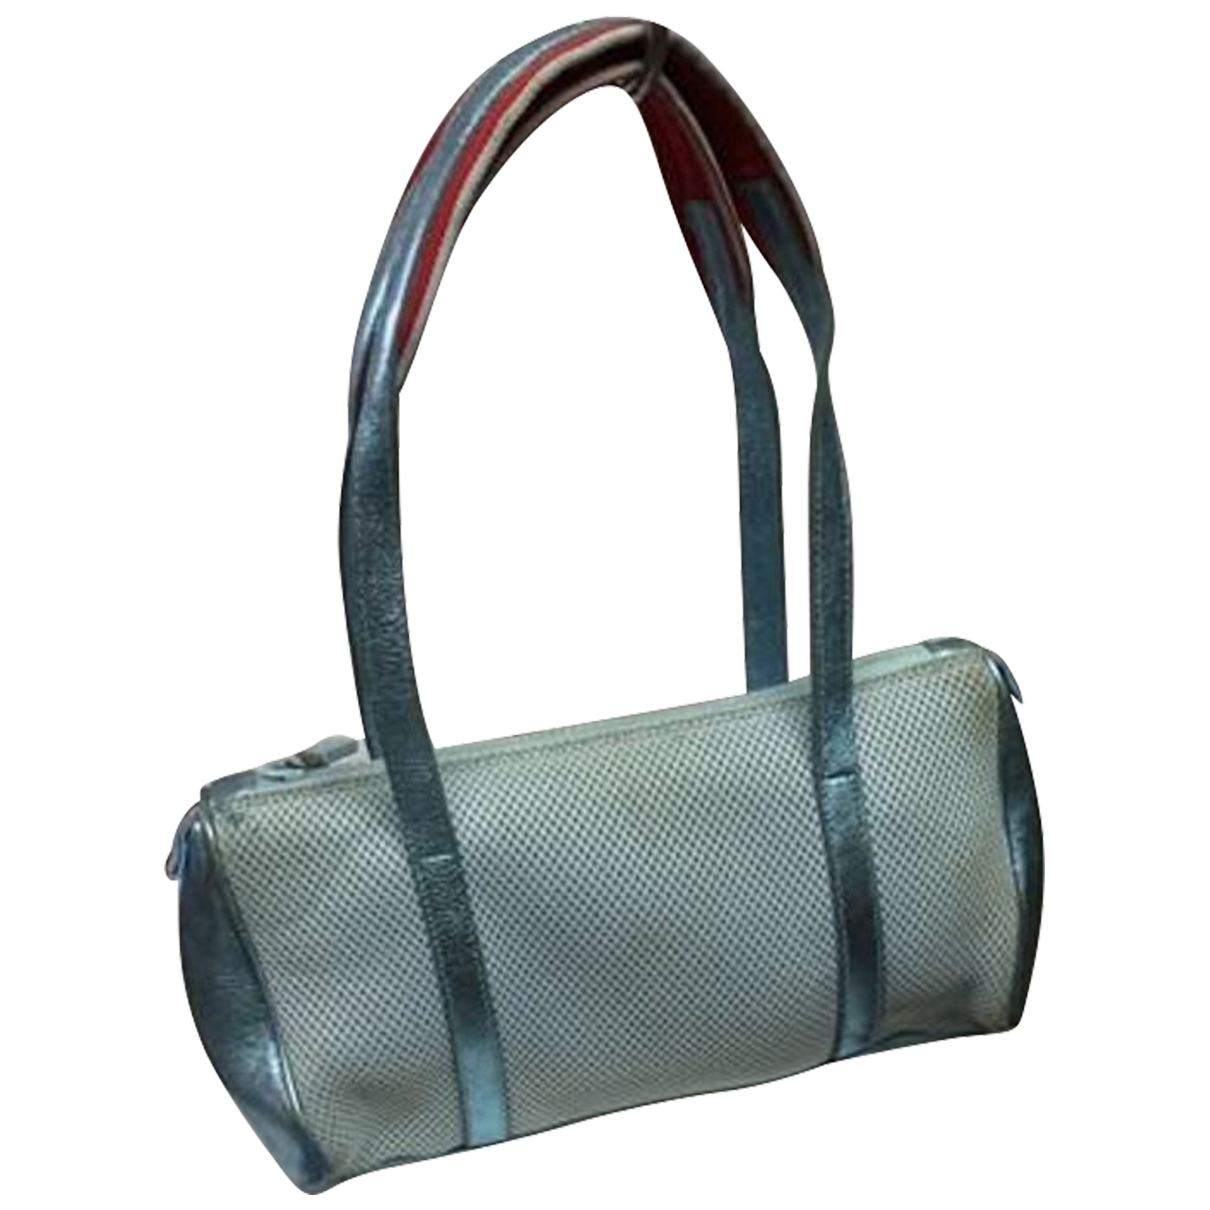 Miu Miu \N Multicolour Patent leather handbag for Women \N